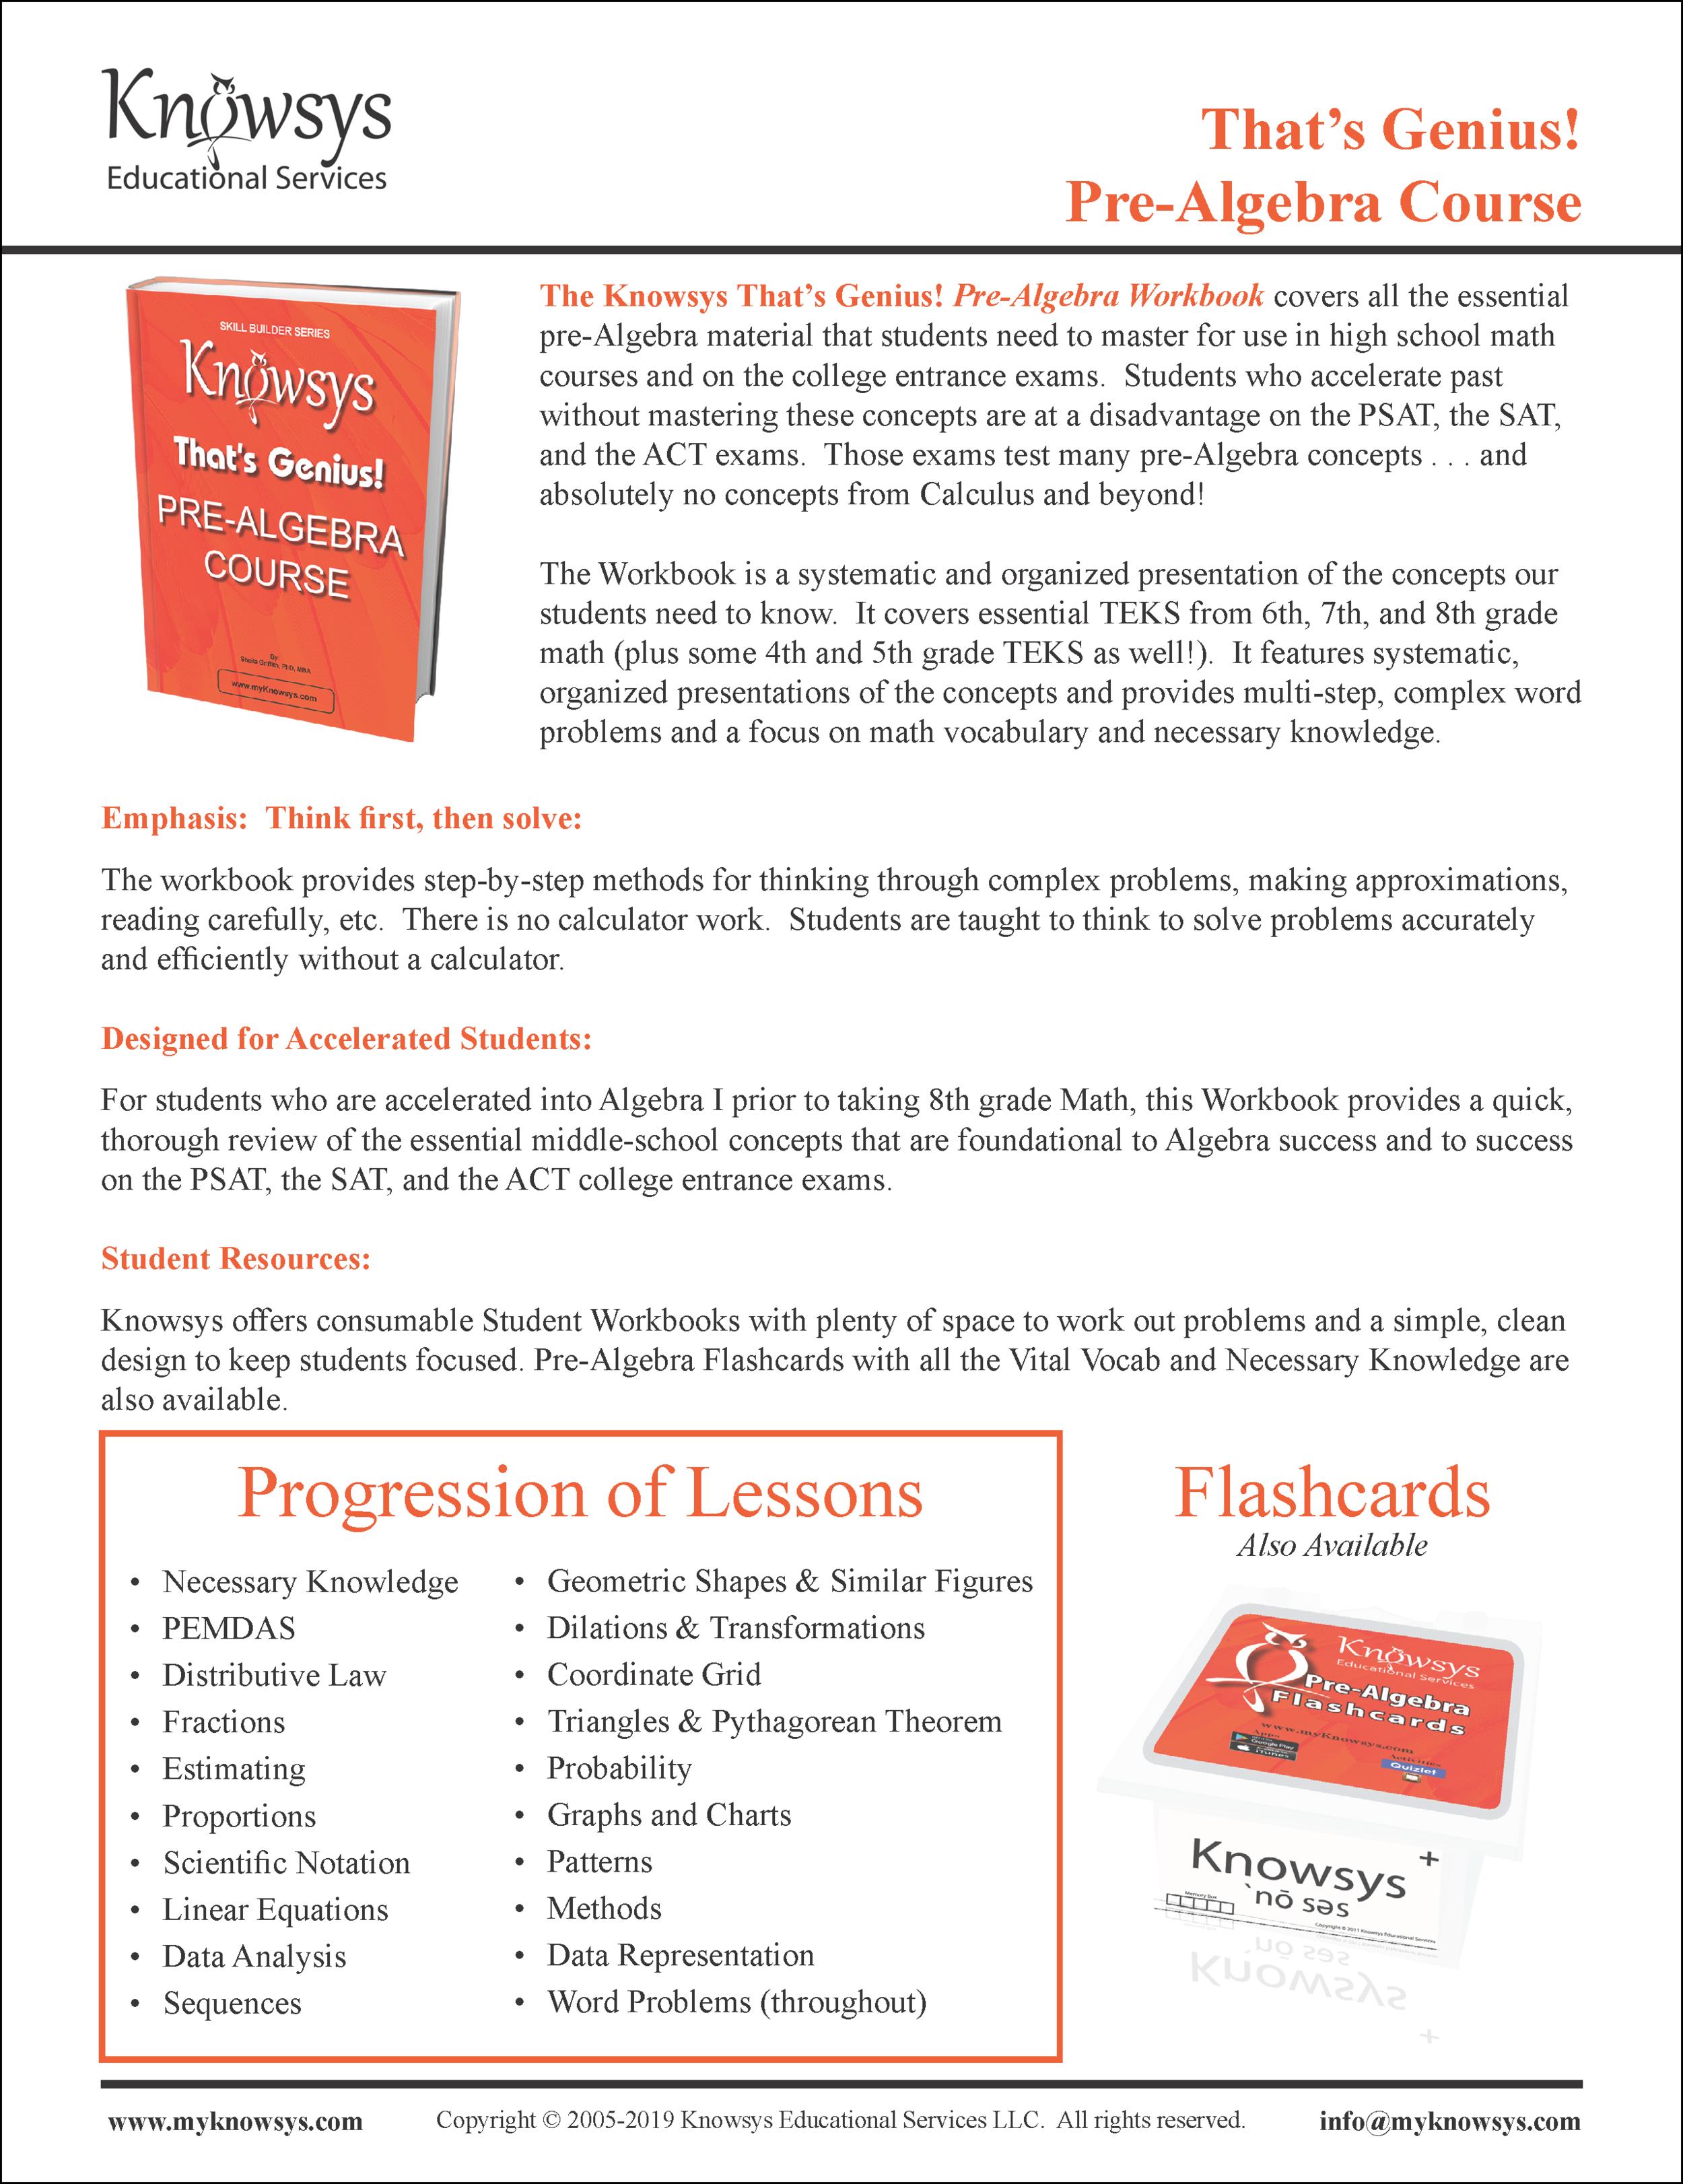 Pre-Algebra Overview